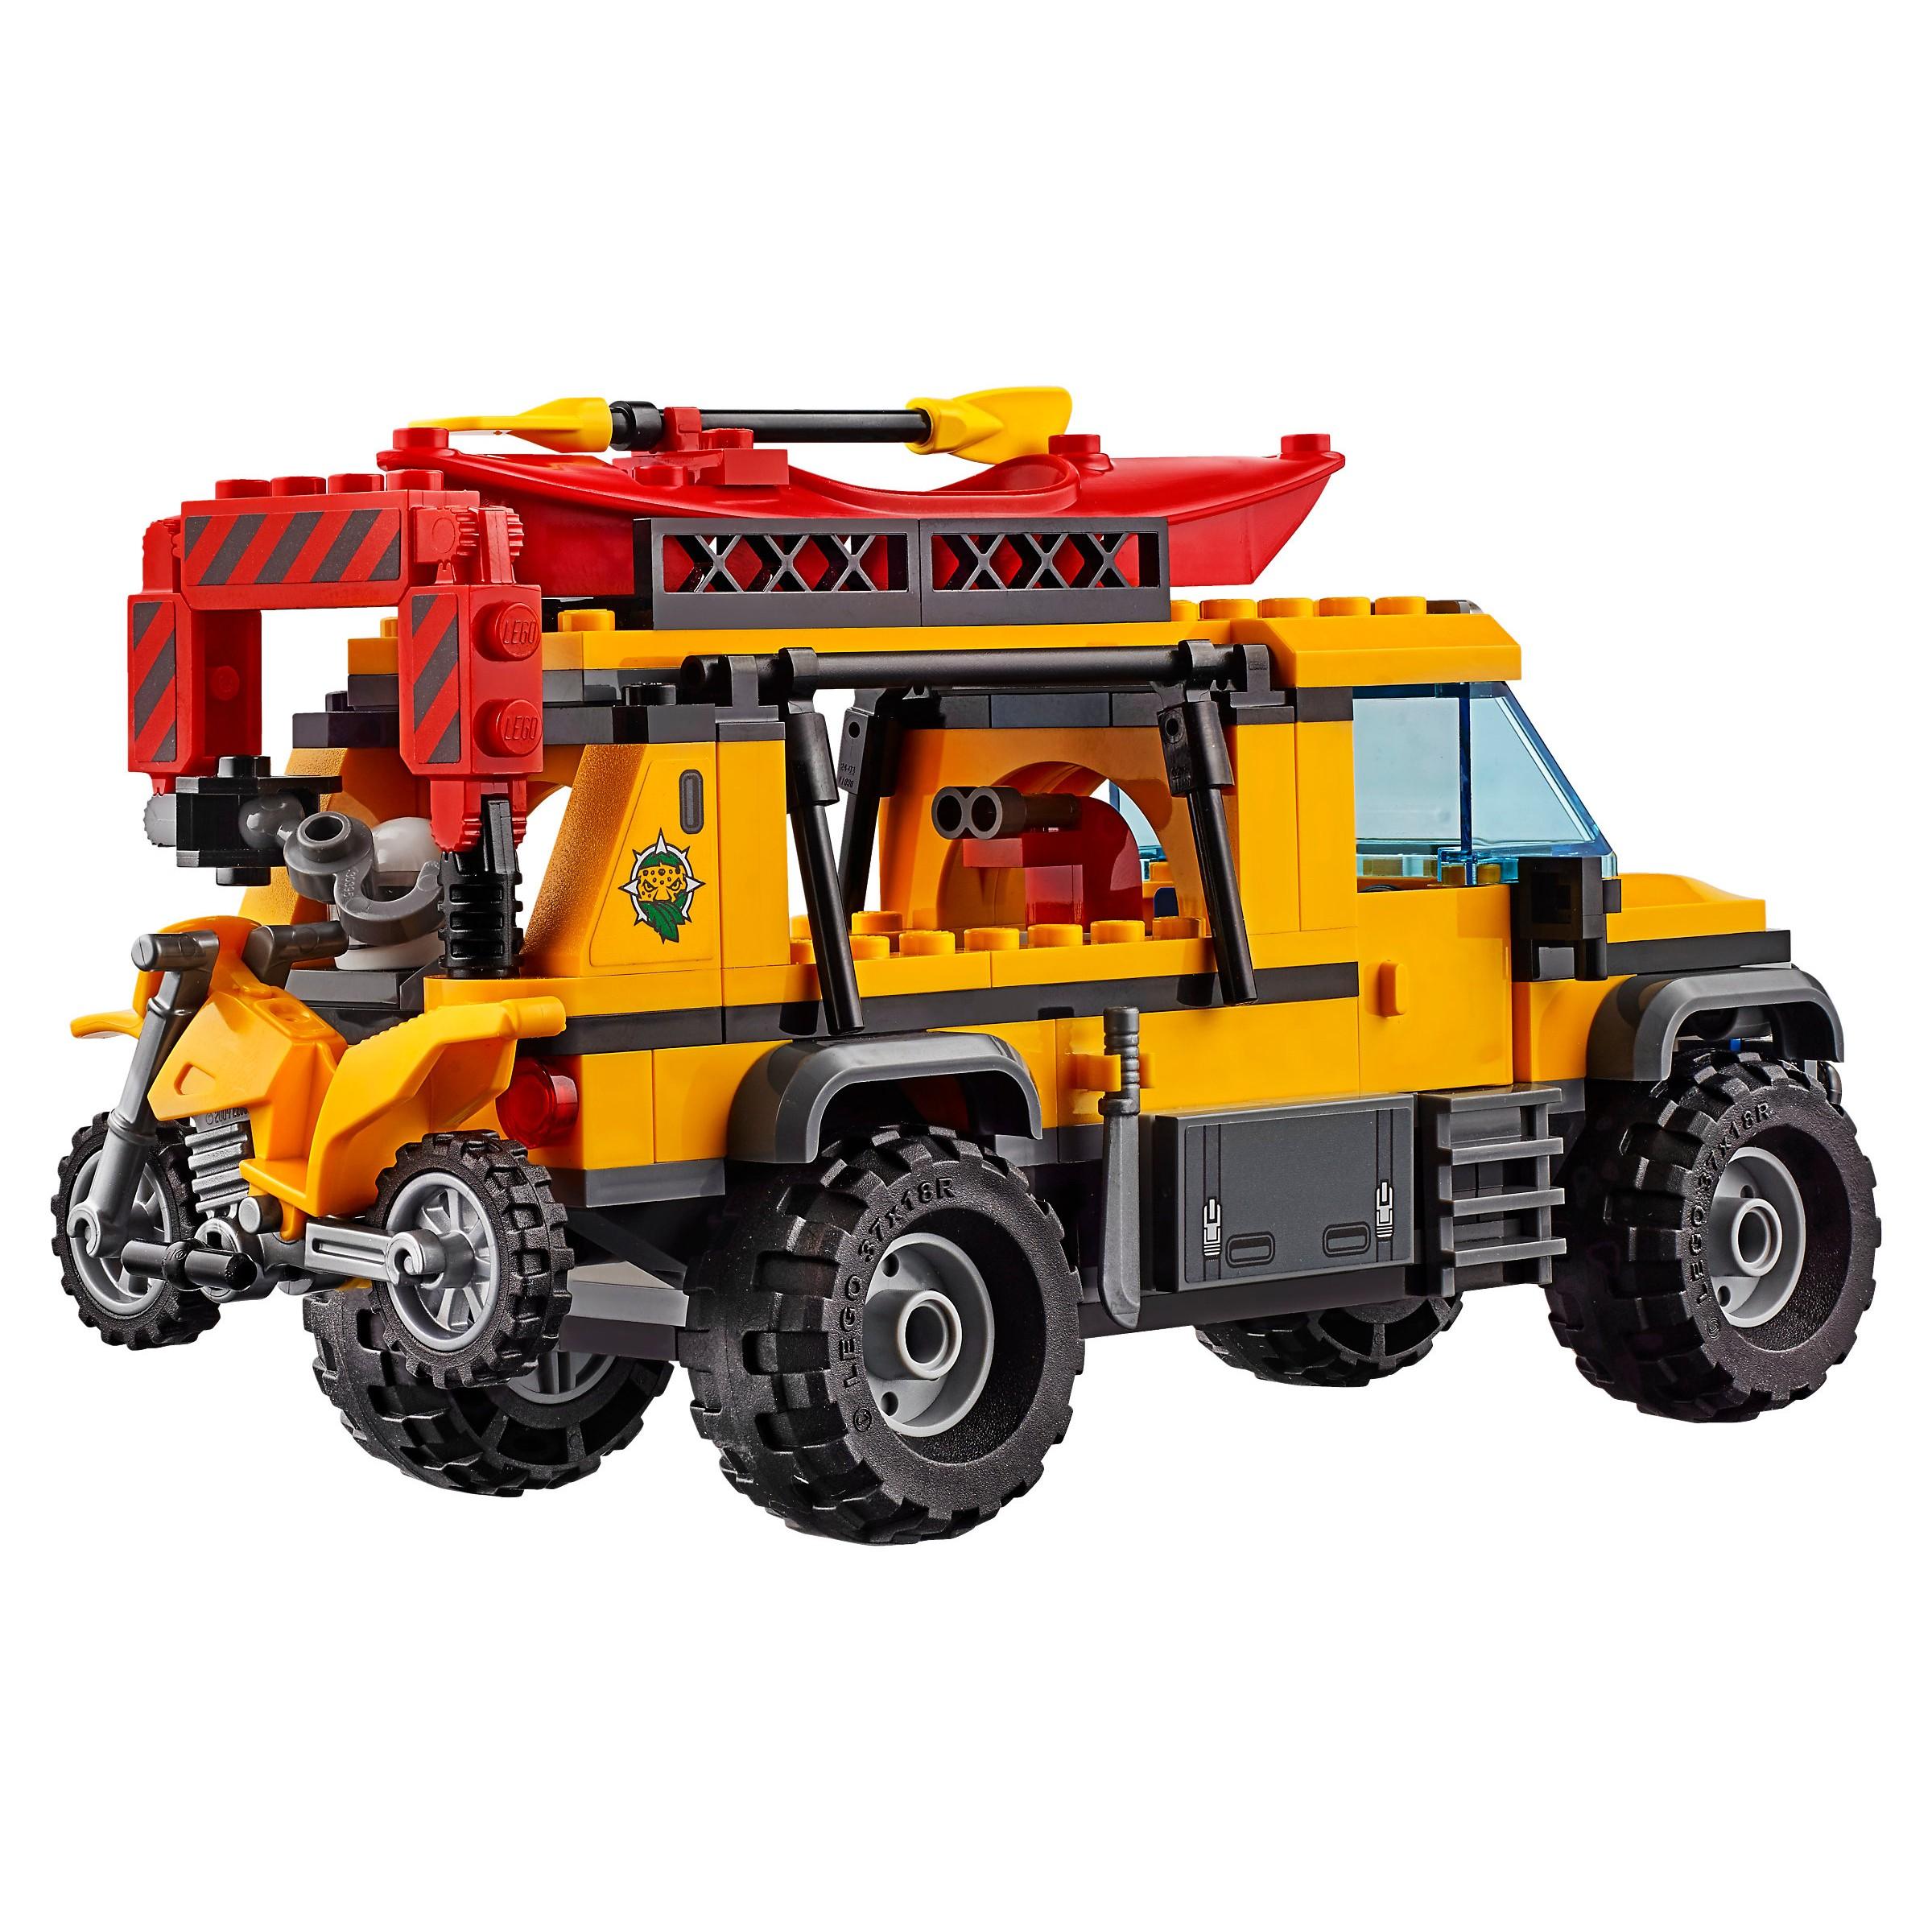 LEGO 60161 City Jungle Exploration Site at Hobby Warehouse